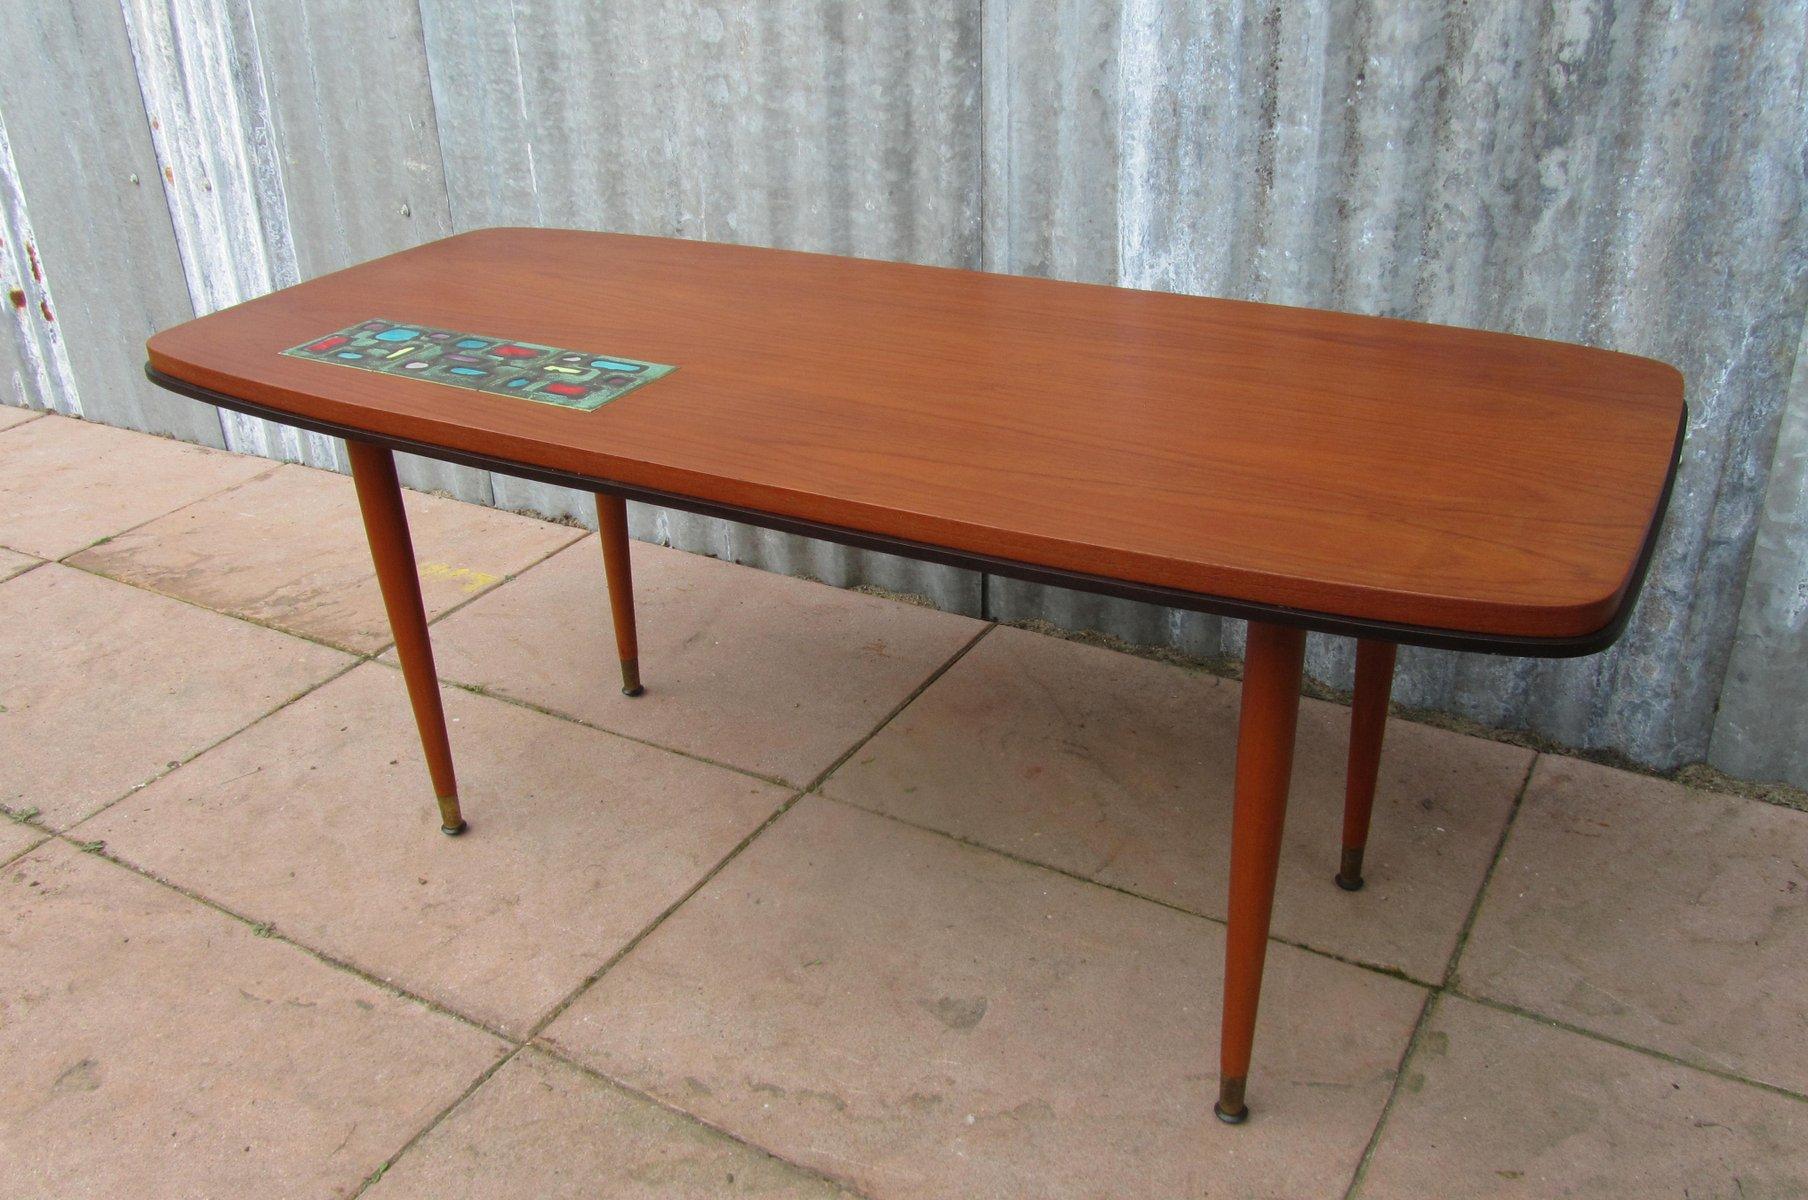 Vintage teak coffee table with ceramic tile 1950s for sale at pamono vintage teak coffee table with ceramic tile 1950s geotapseo Choice Image